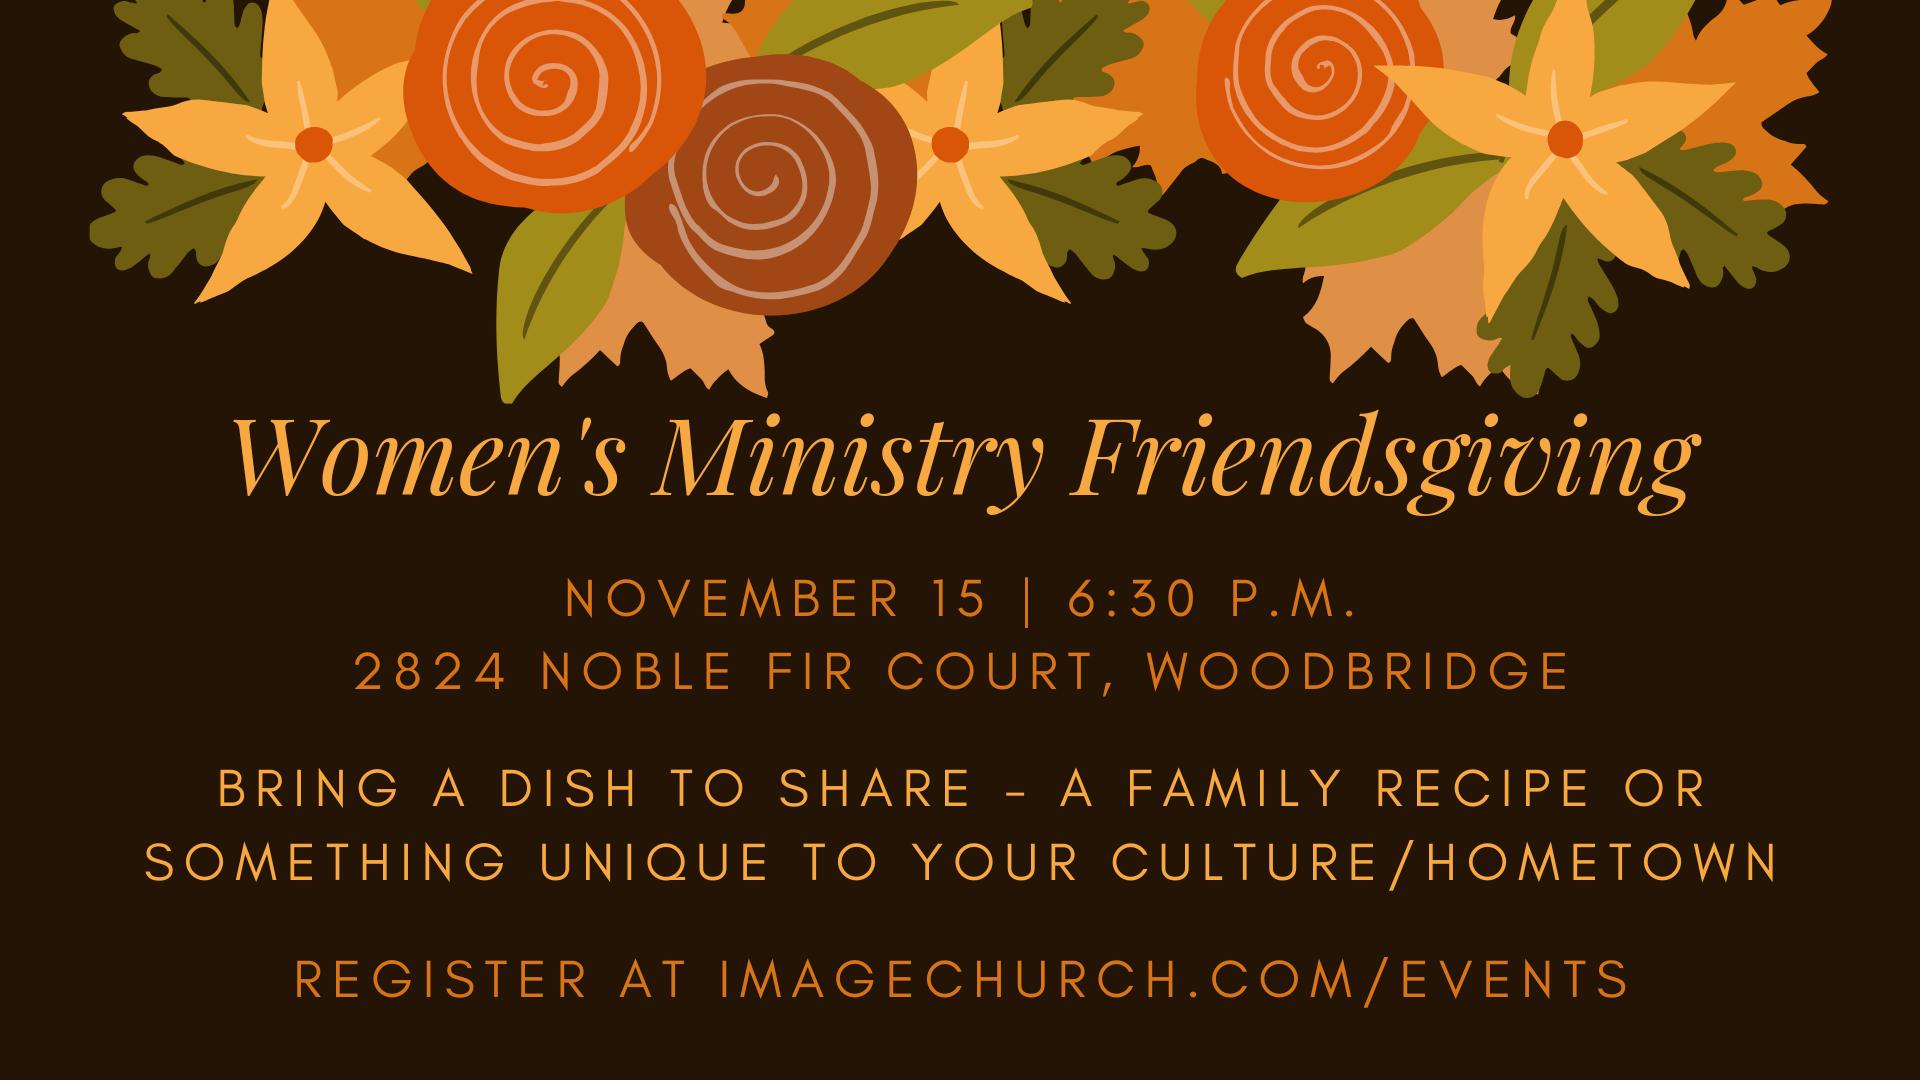 Women's Ministry Friendsgiving TV.png